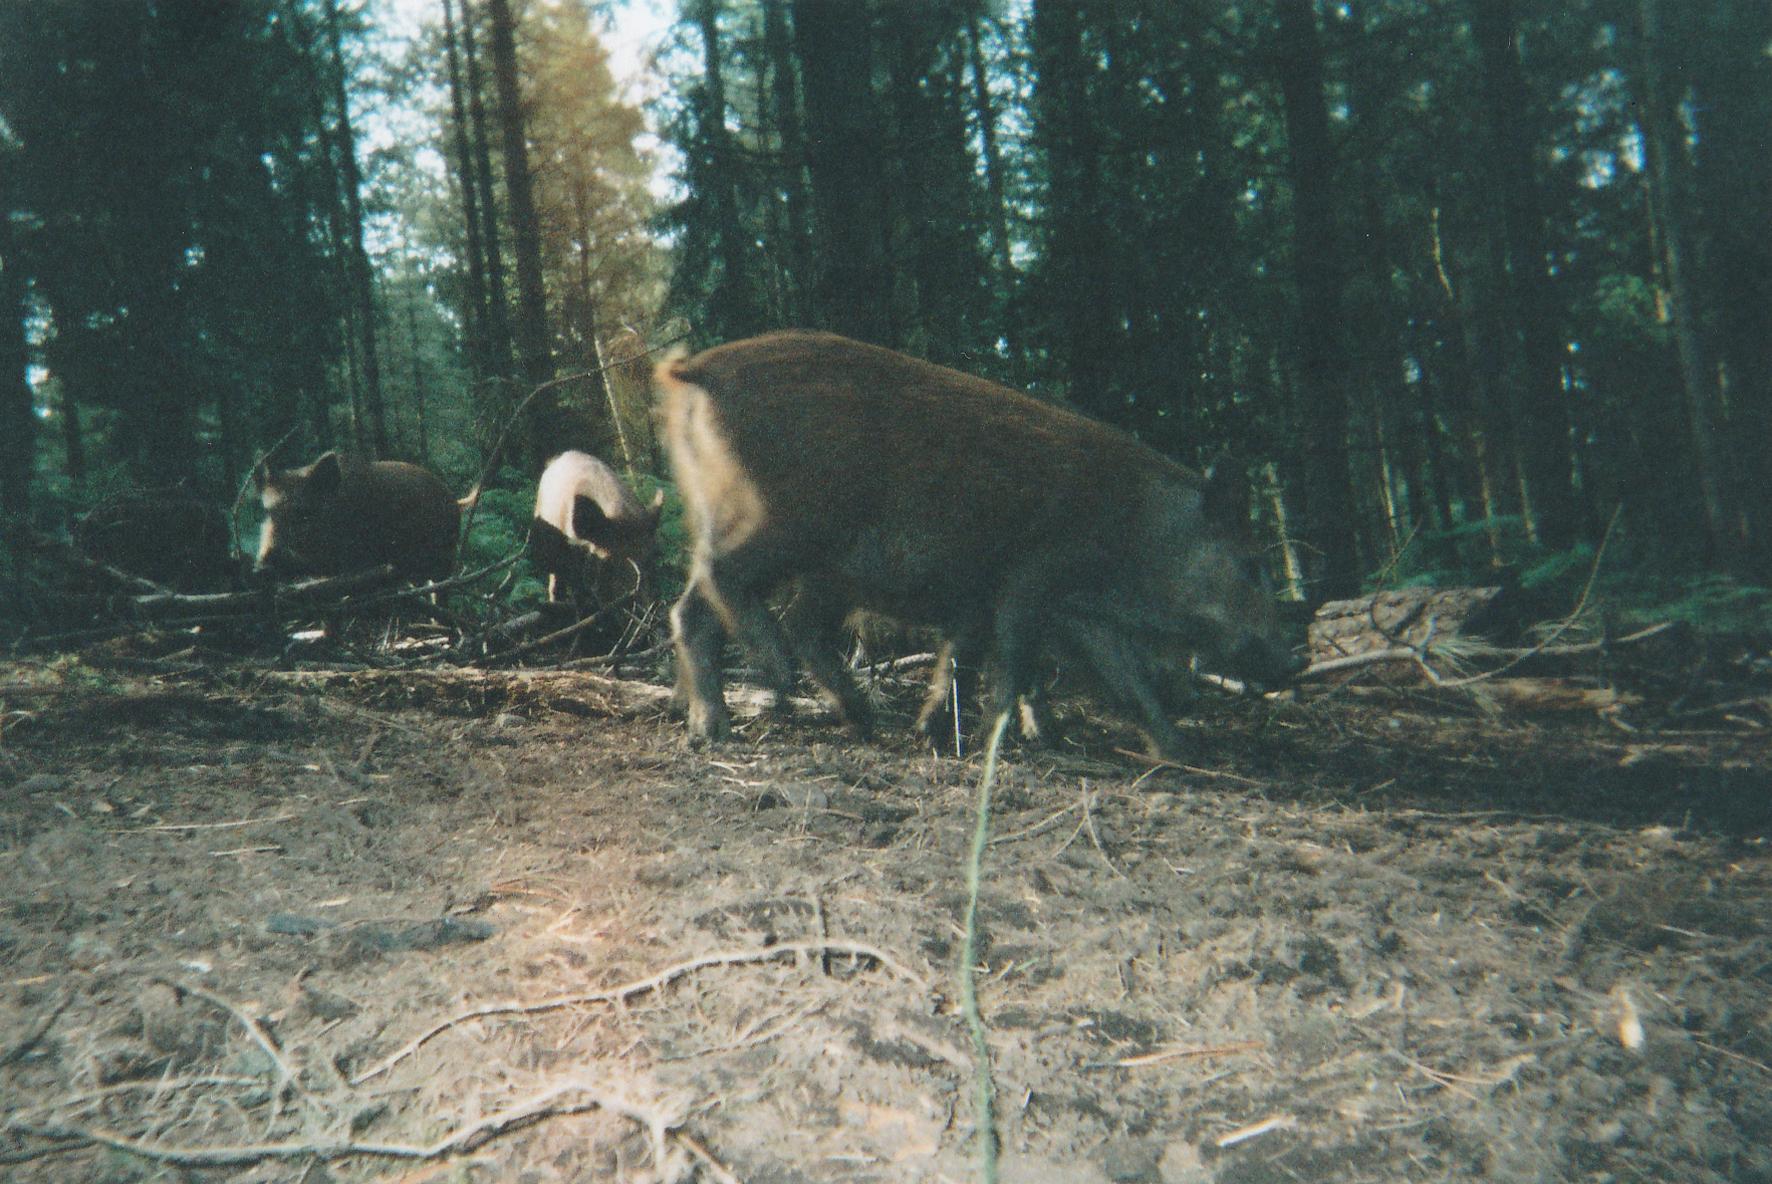 Wild Boar Photos 23.jpg